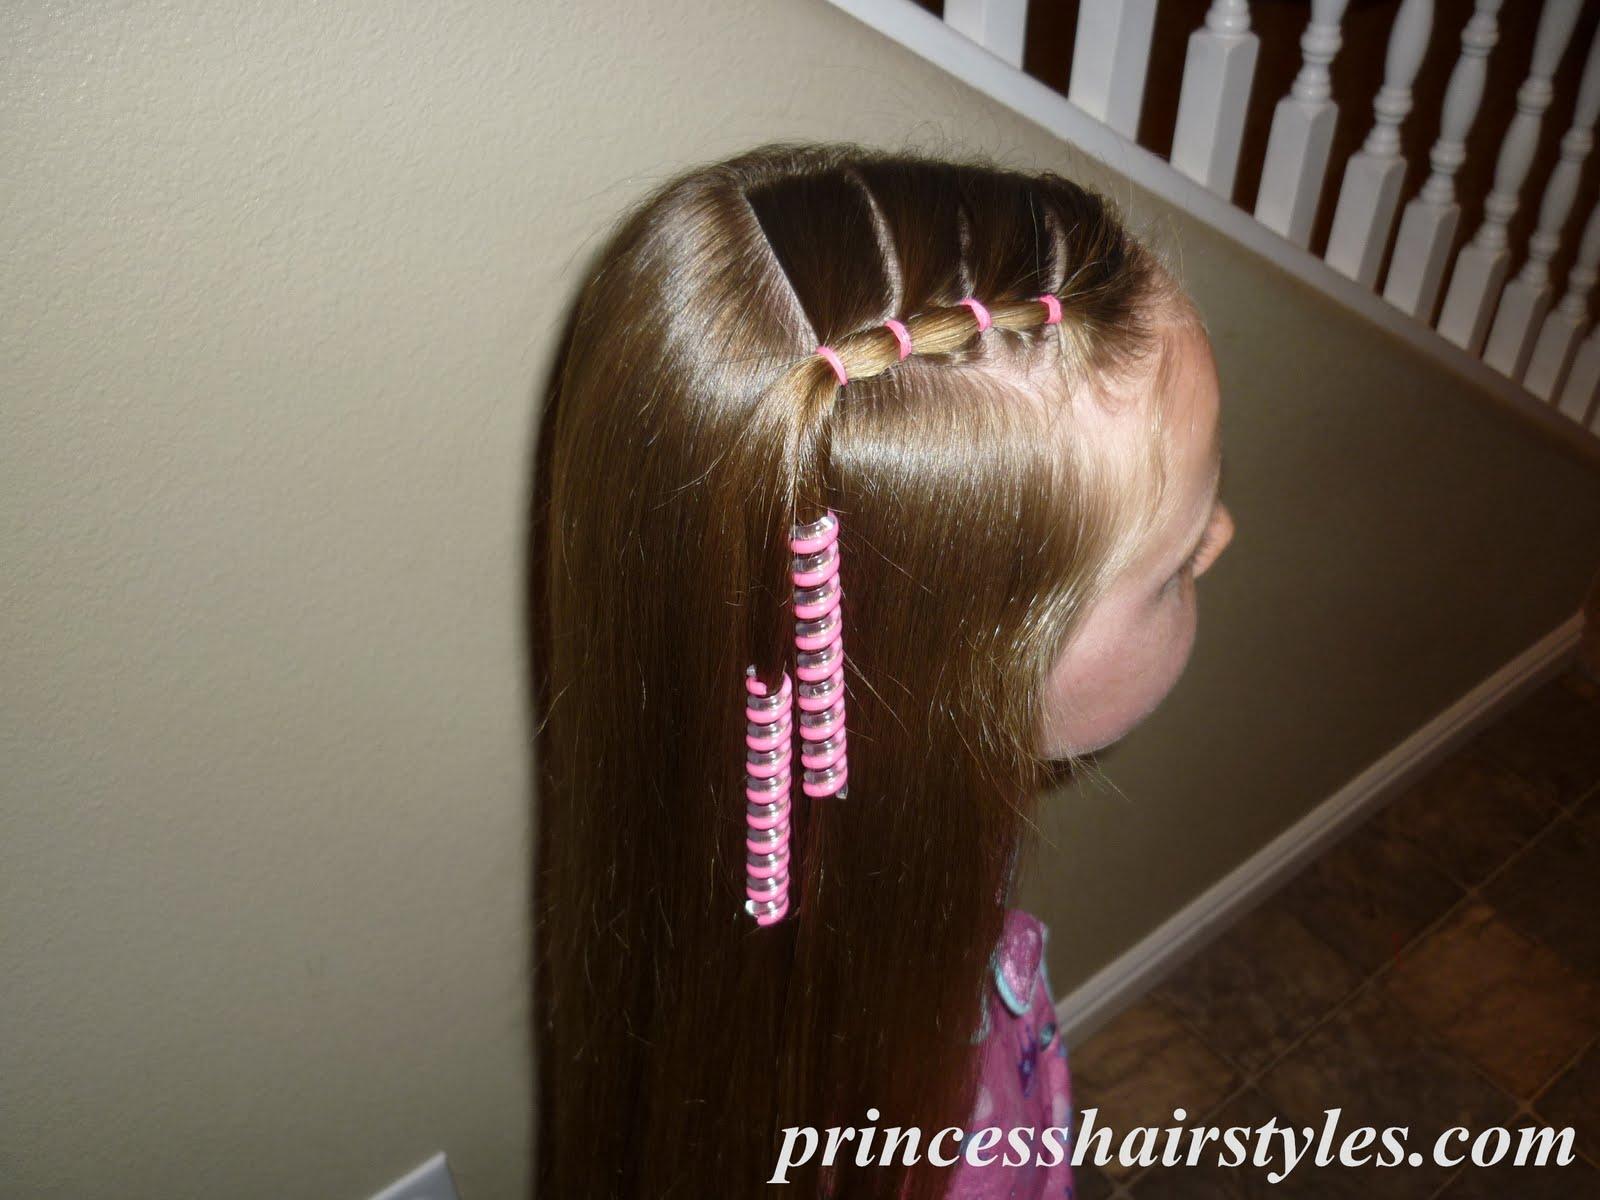 Super Elastics To The Side Hairstyles For Girls Princess Hairstyles Short Hairstyles Gunalazisus